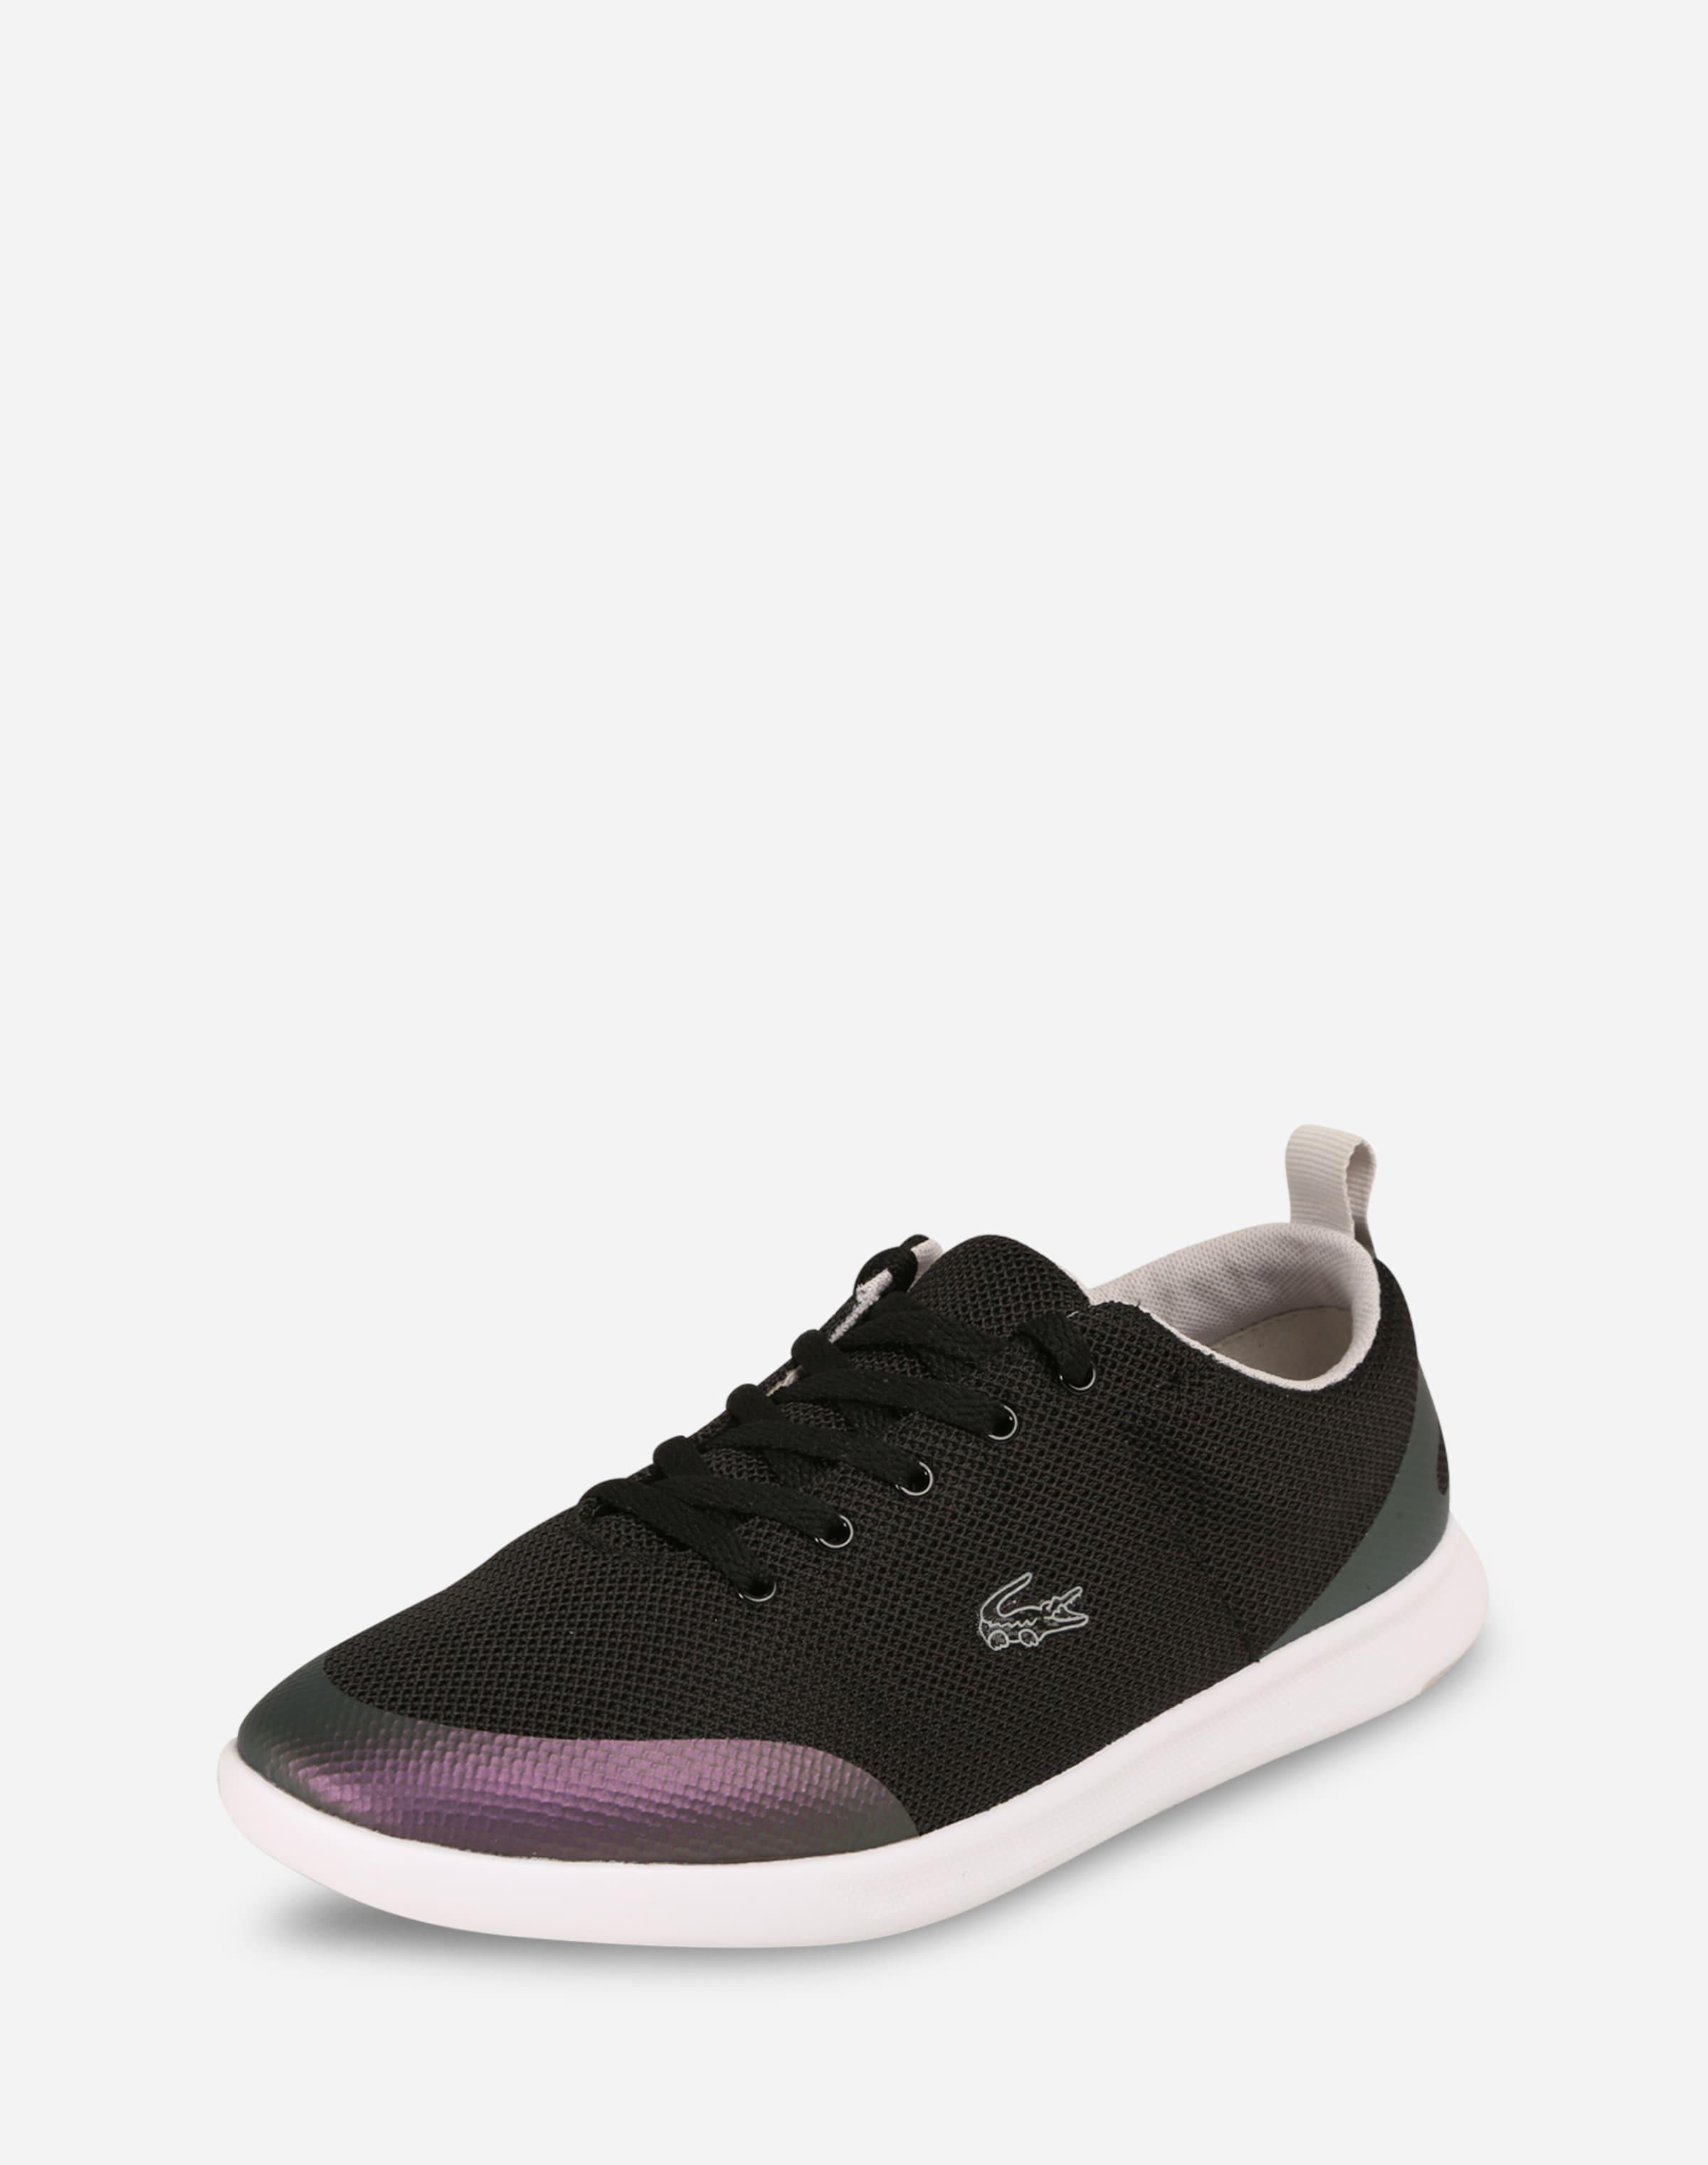 LACOSTE Sneakers Avenir Verschleißfeste billige Schuhe